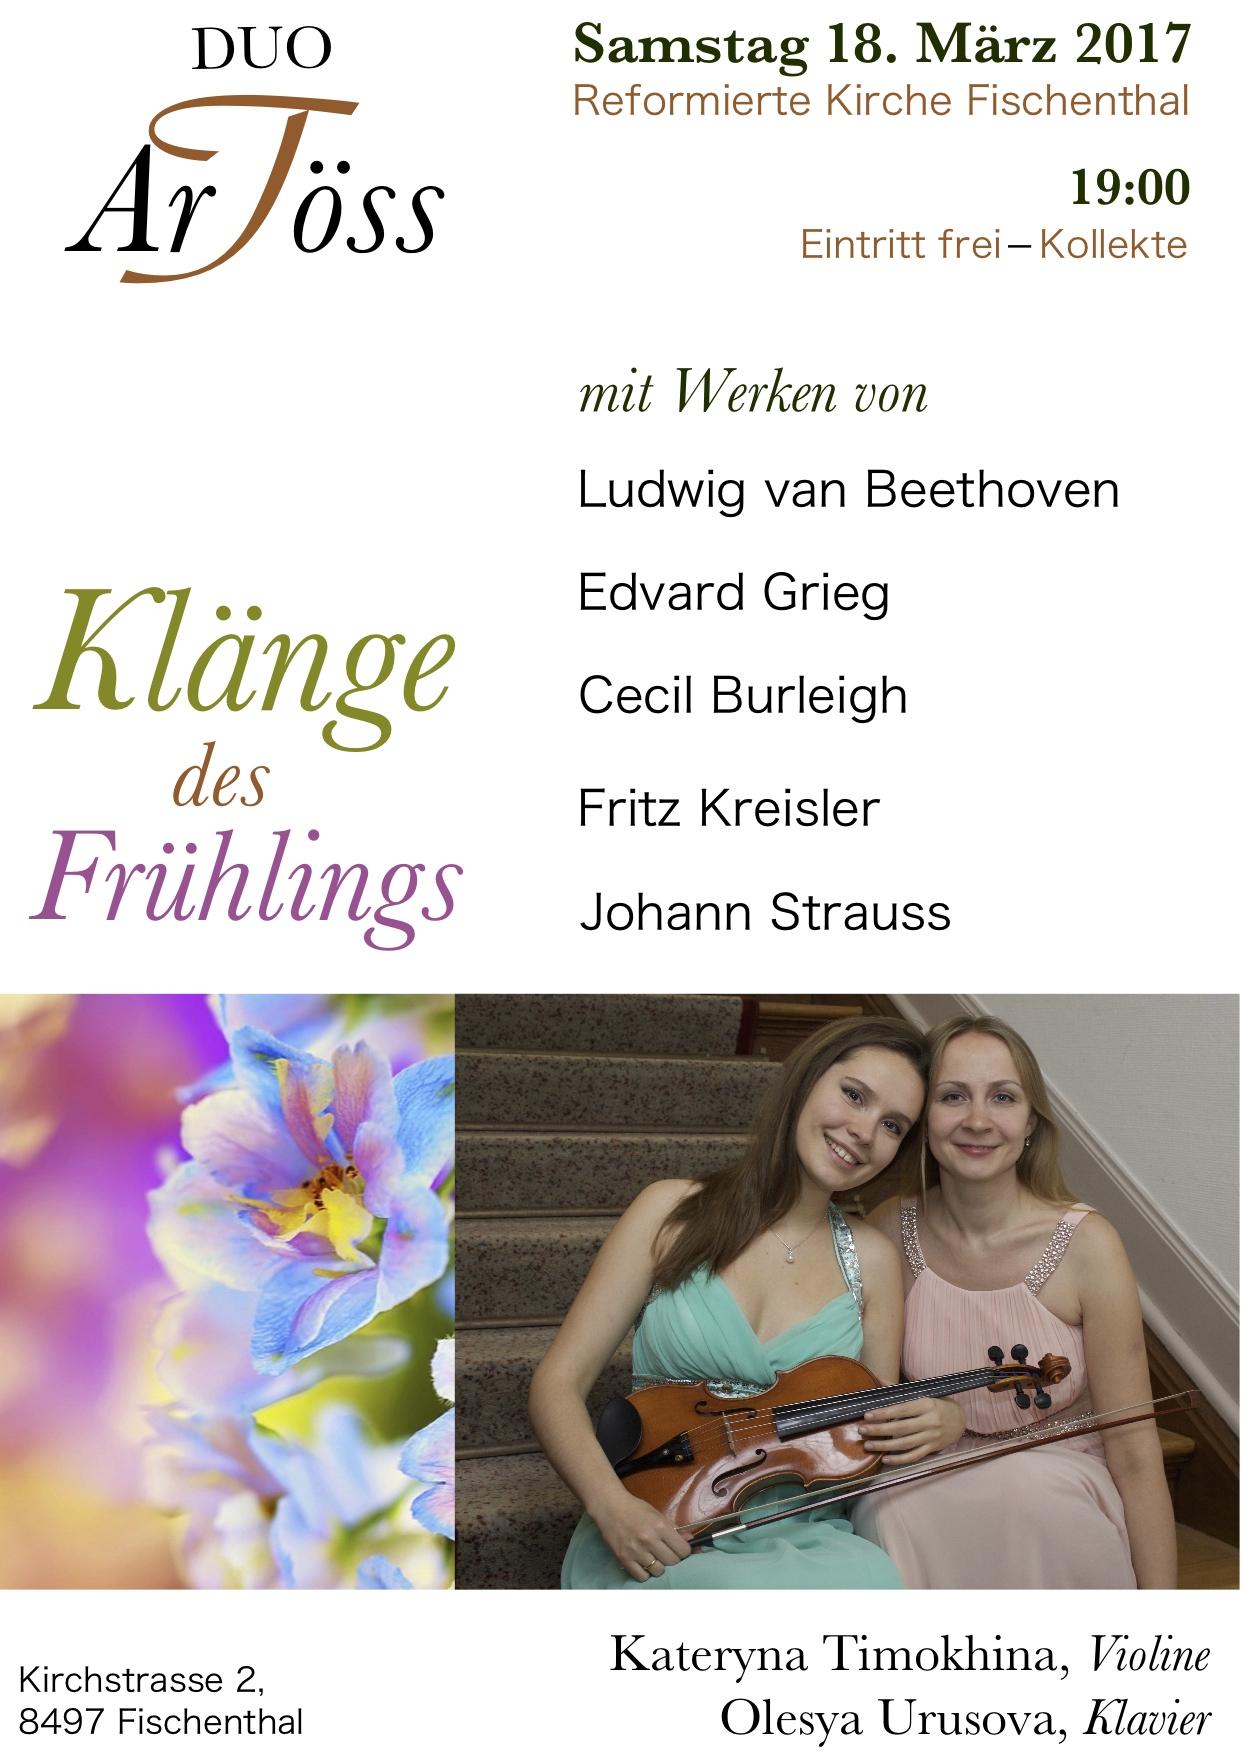 Duo ArTtöss, Olesya Urusova Piano, Kateryna Timokhina Violine